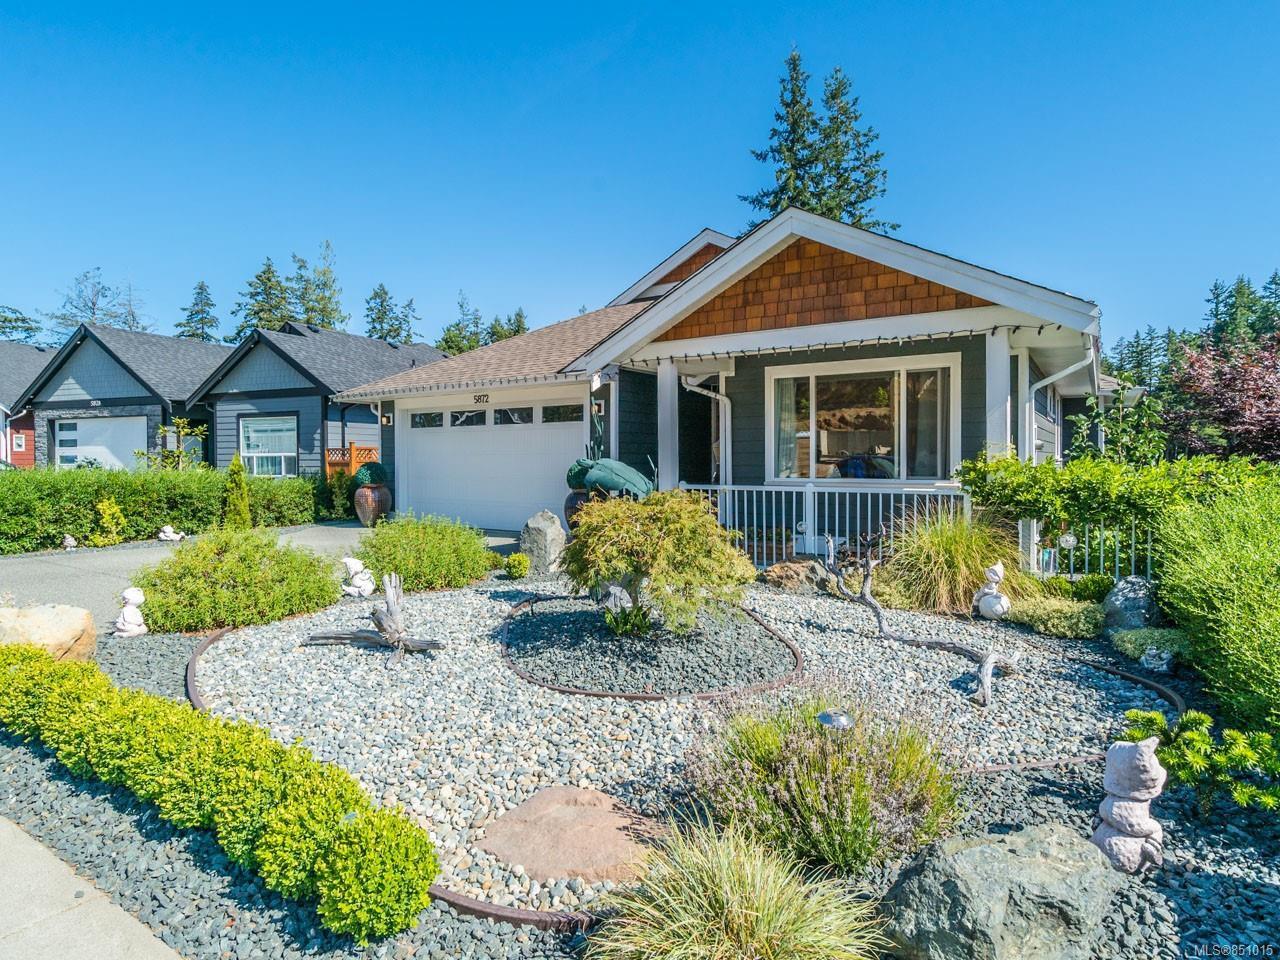 Main Photo: 5872 Linyard Rd in : Na North Nanaimo Single Family Detached for sale (Nanaimo)  : MLS®# 851015